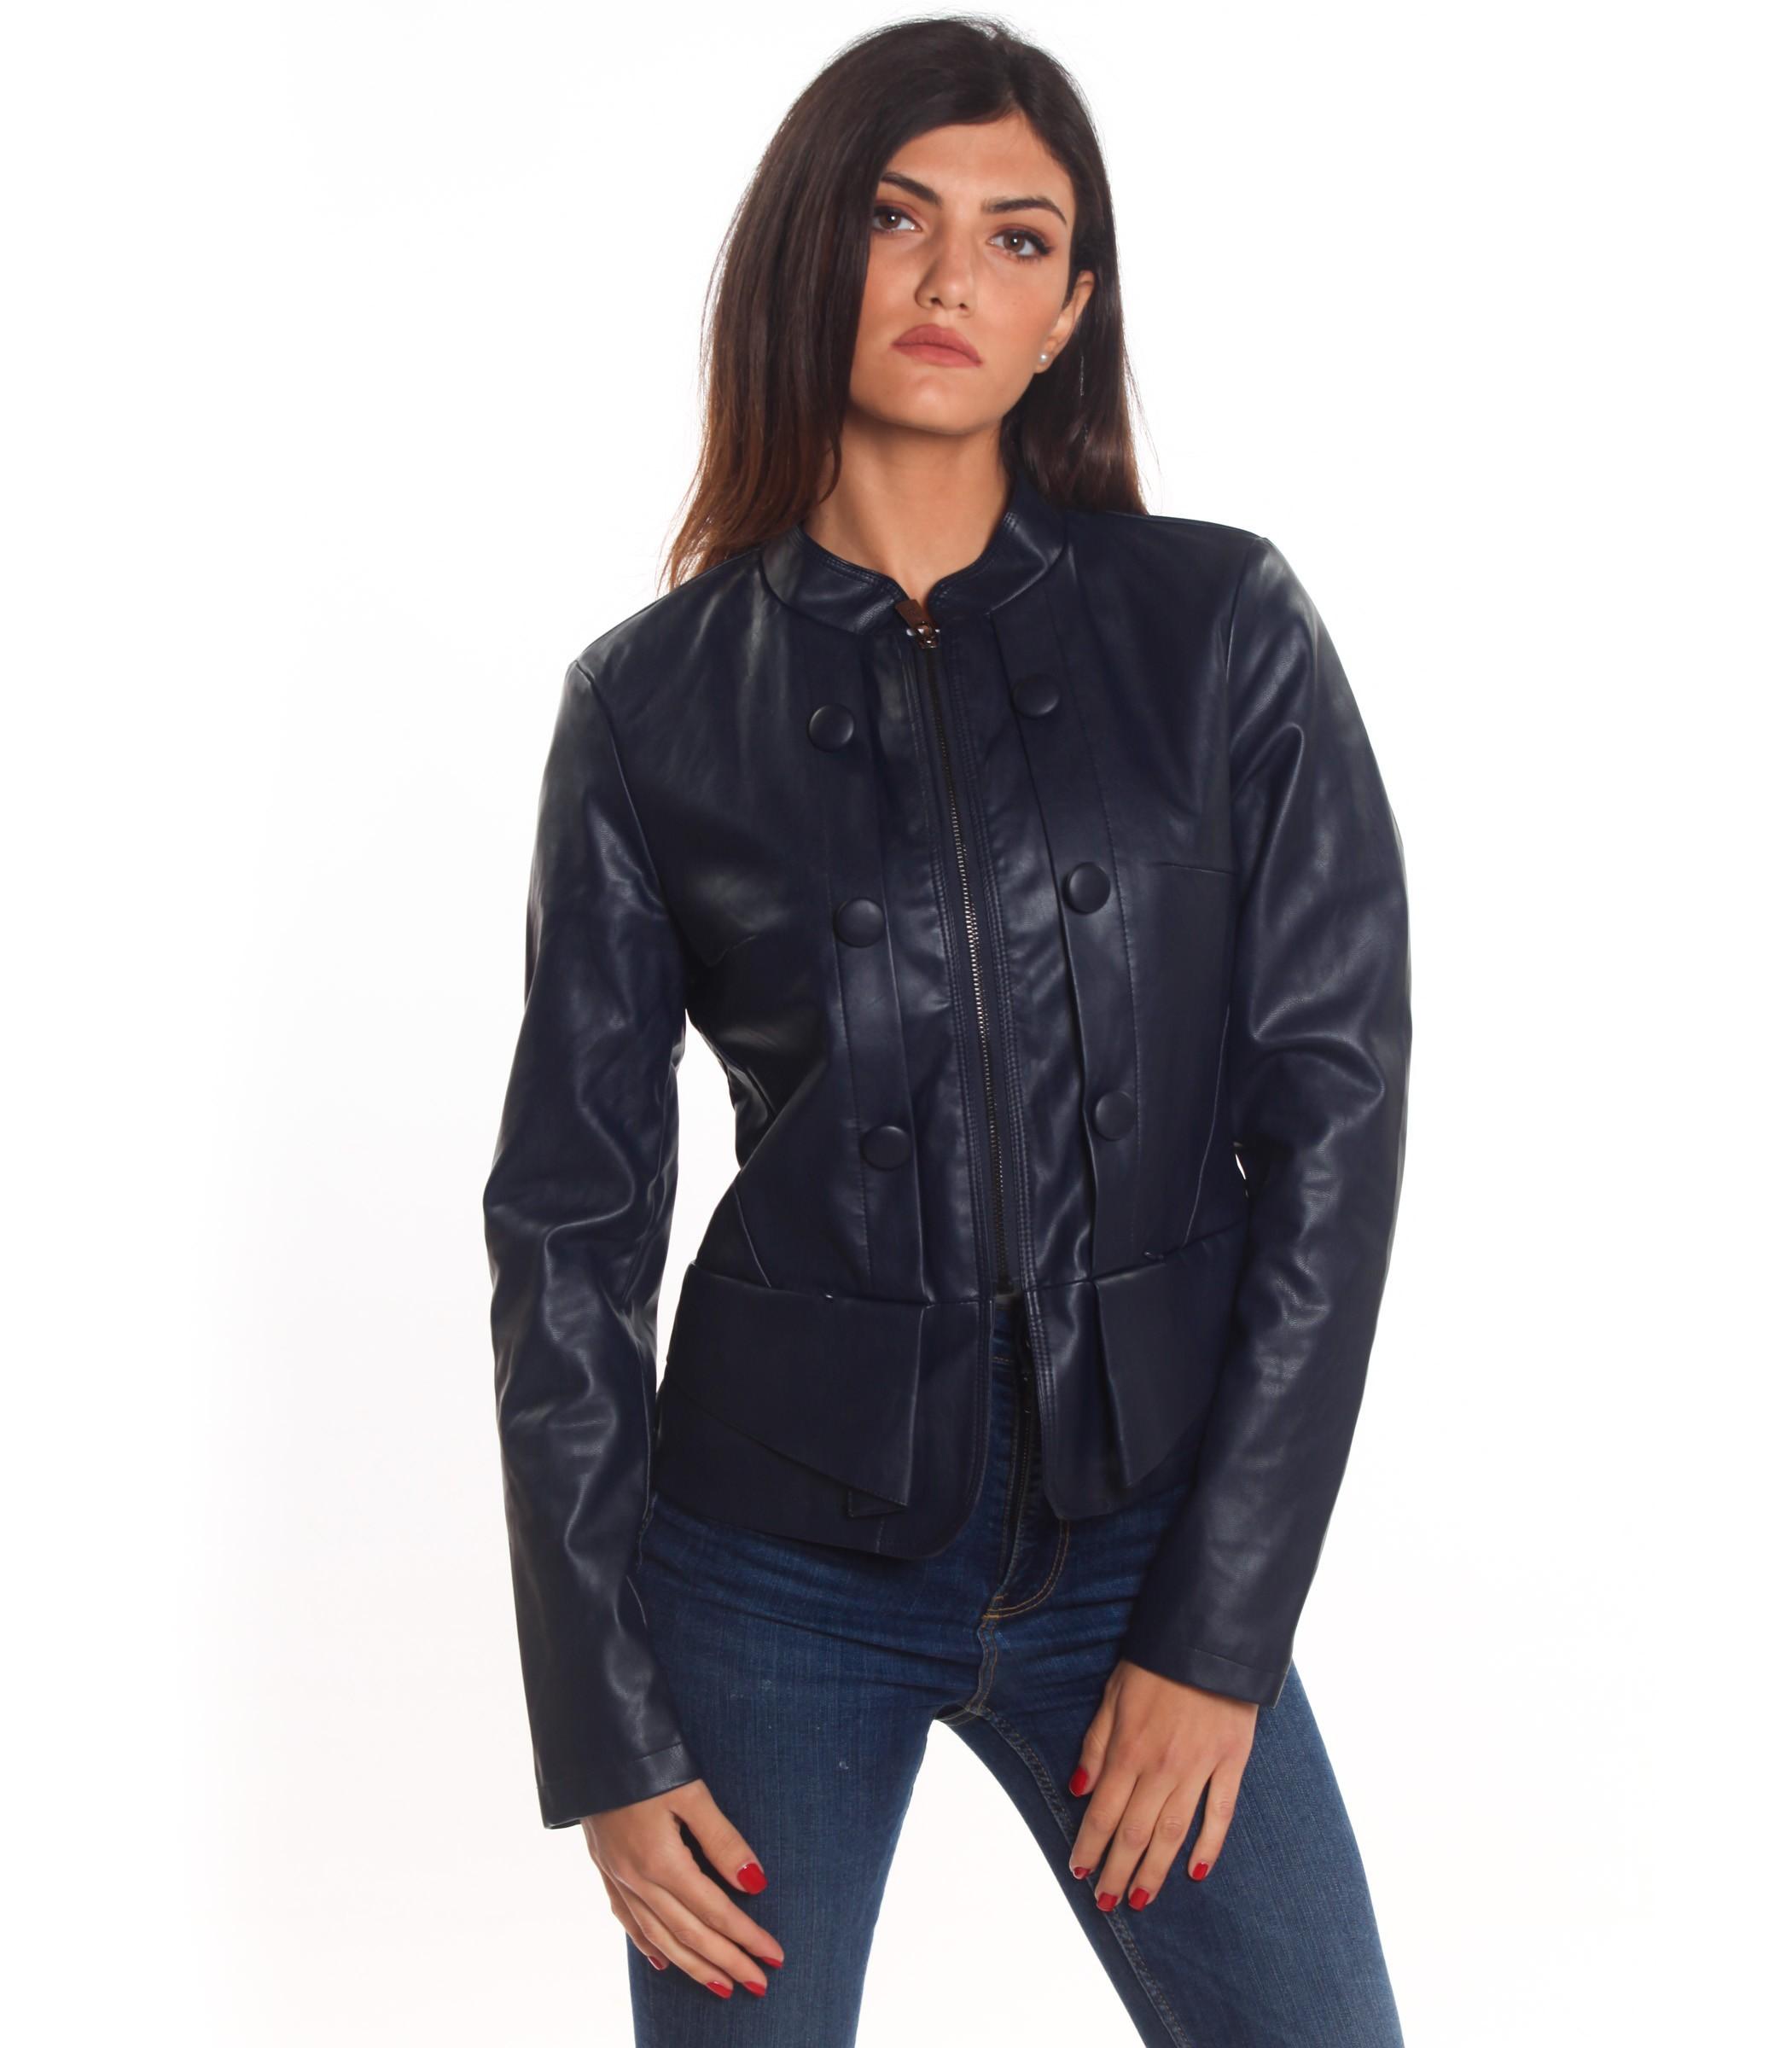 online retailer 90261 9f48e Giubbotto Giubbino Giacca Yes Zee in eco pelle da donna rif ...